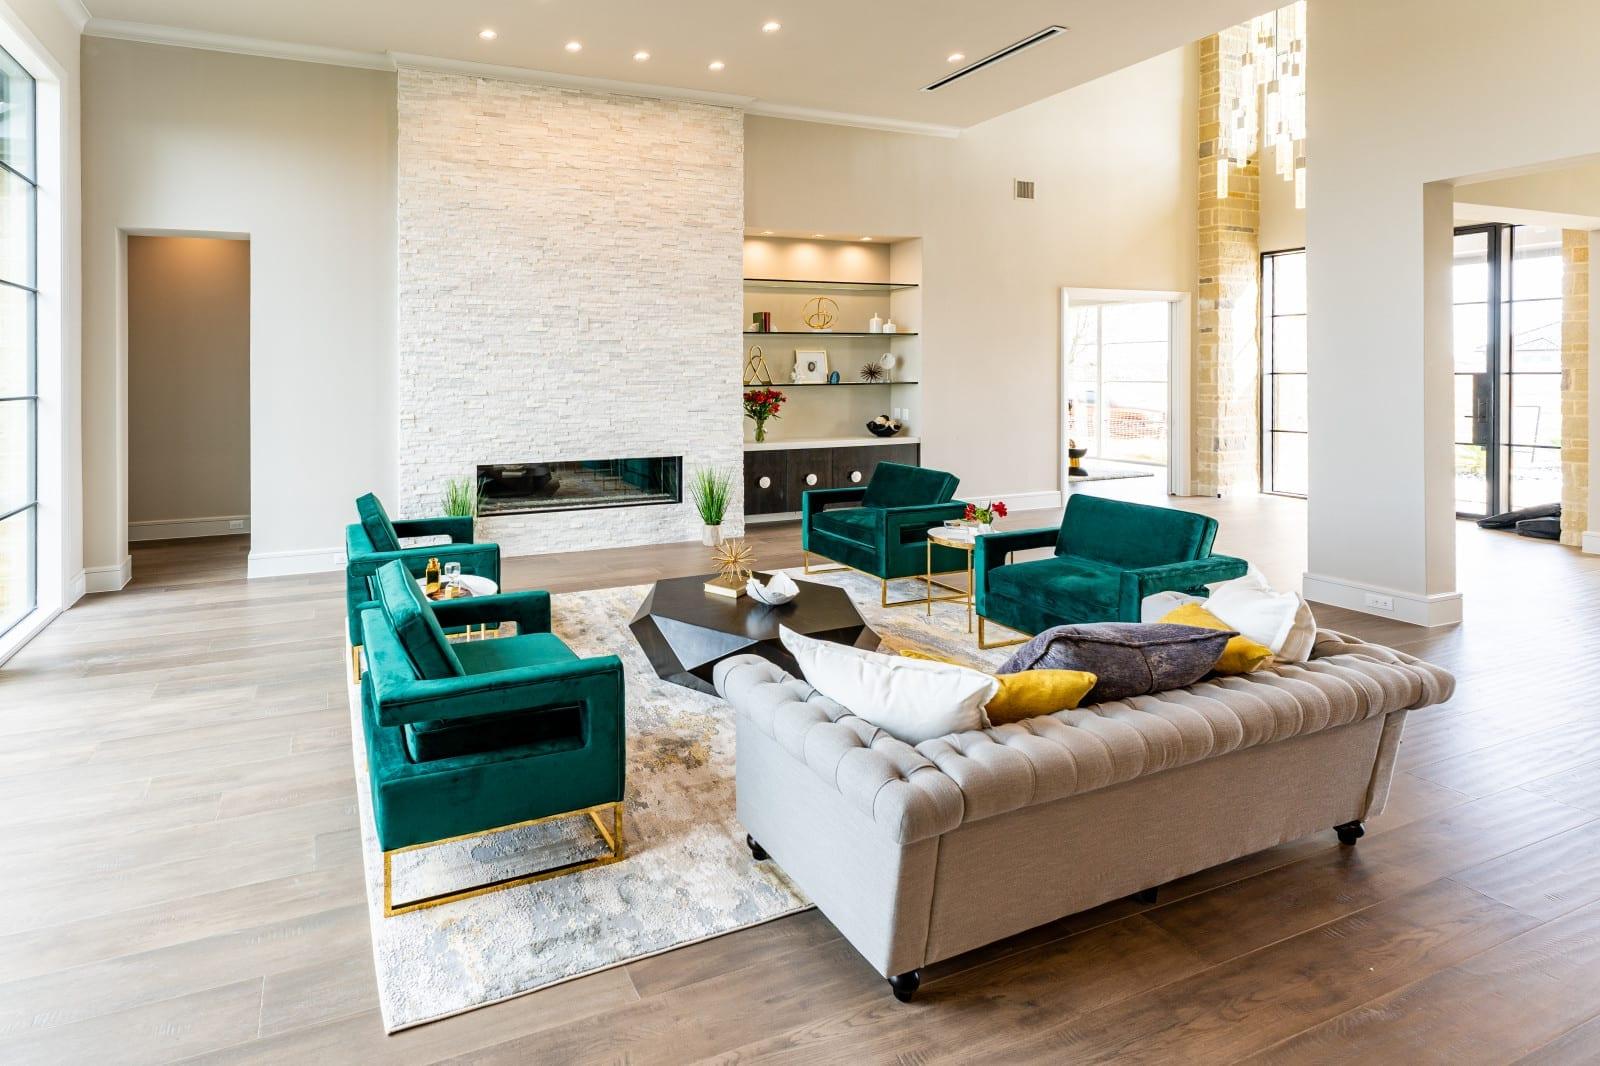 Modern Style Homes design # 18 - Millennial Design + Build